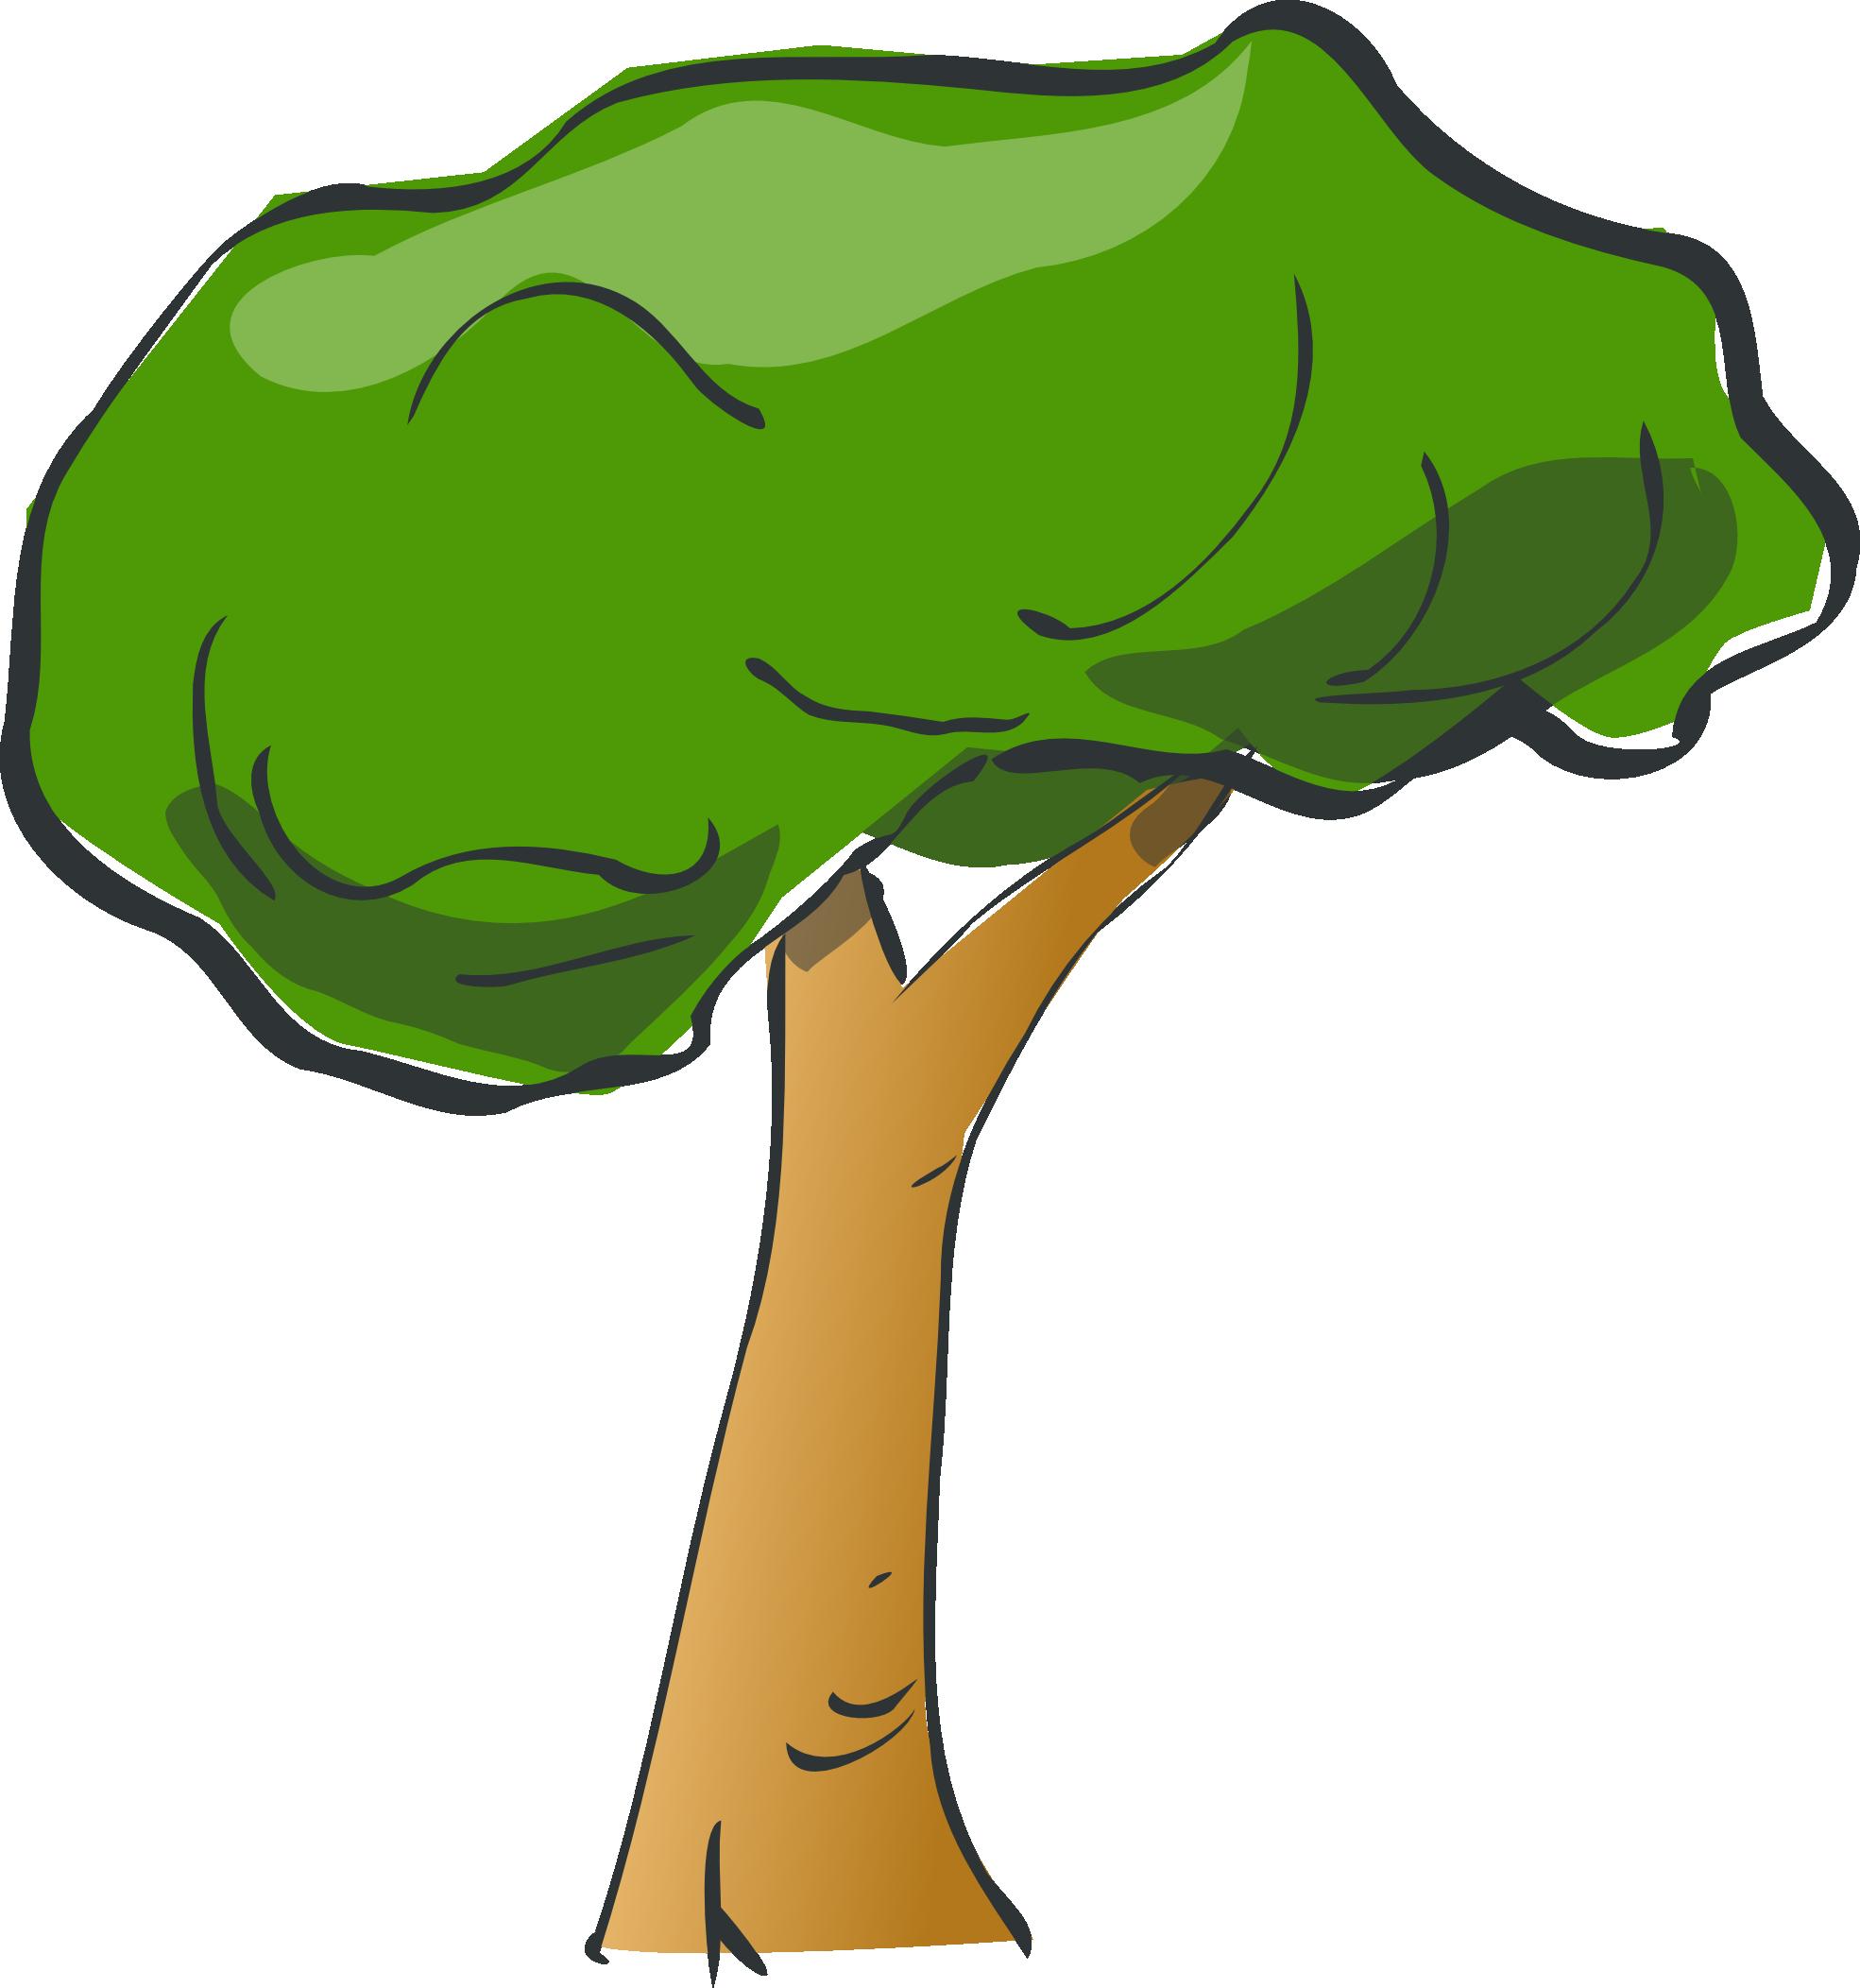 Baum clipart #3, Download drawings